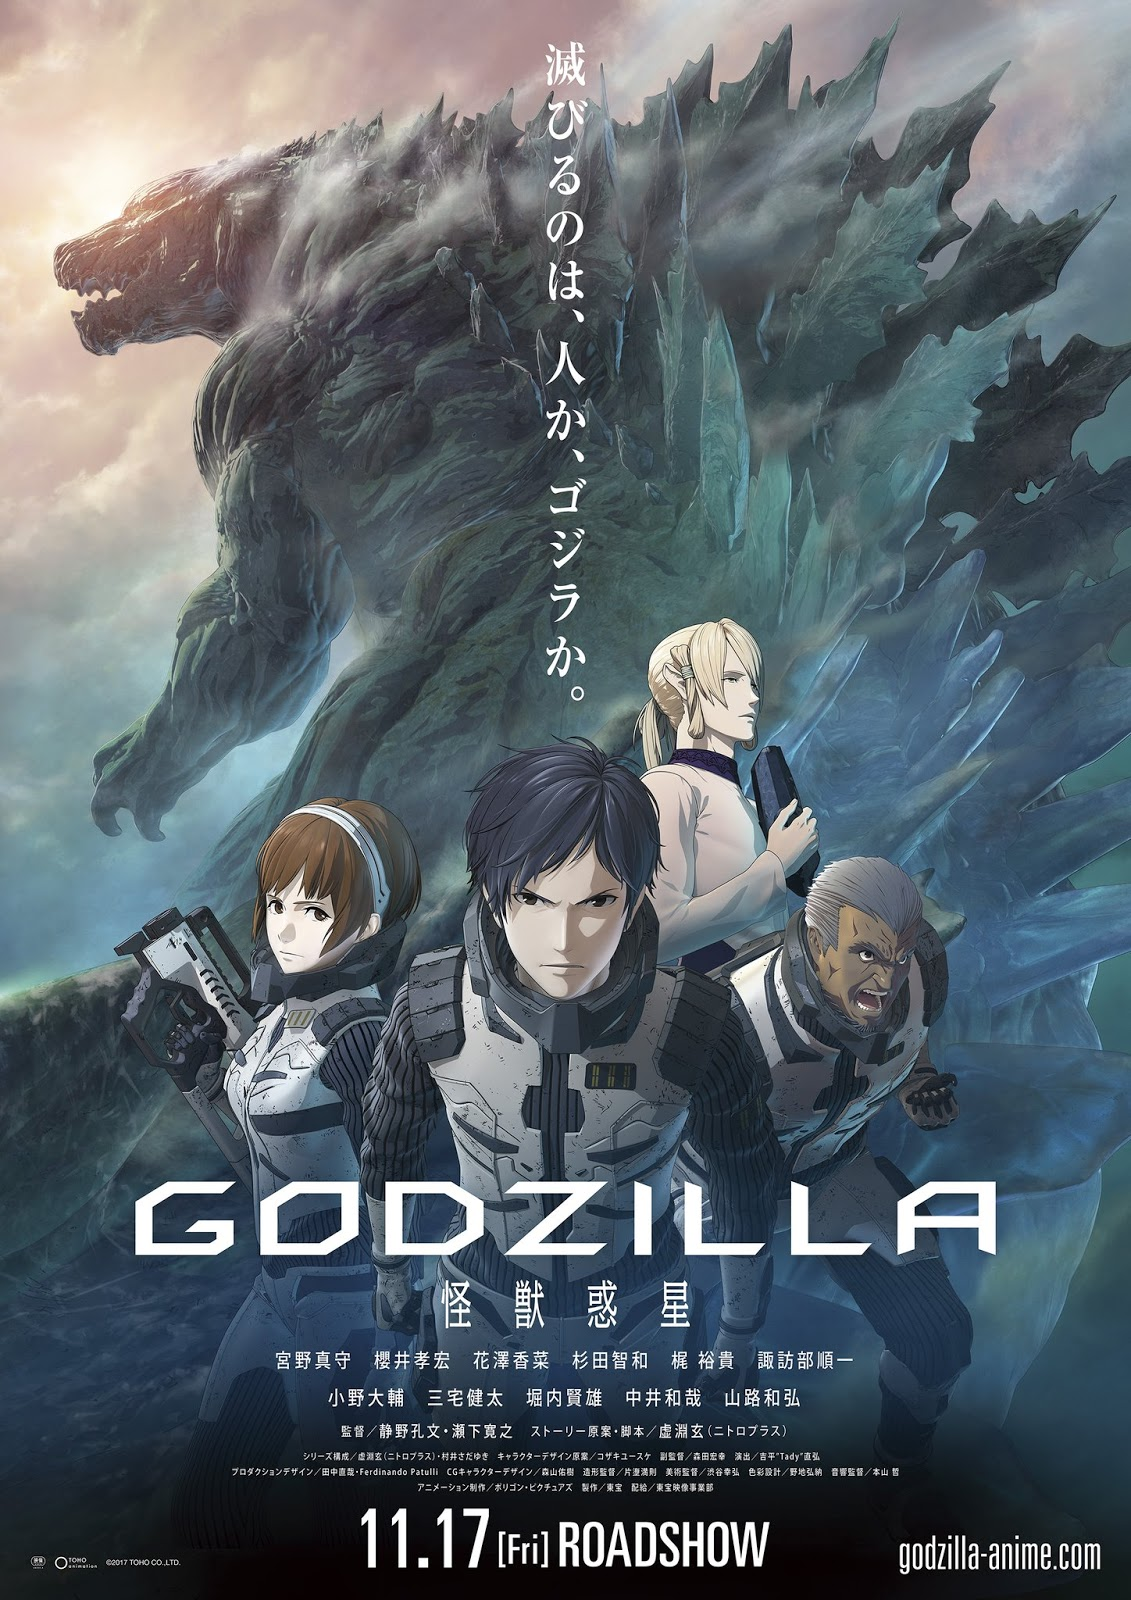 Godzilla: Planet of the Monsters - Hiroyuki Seshita